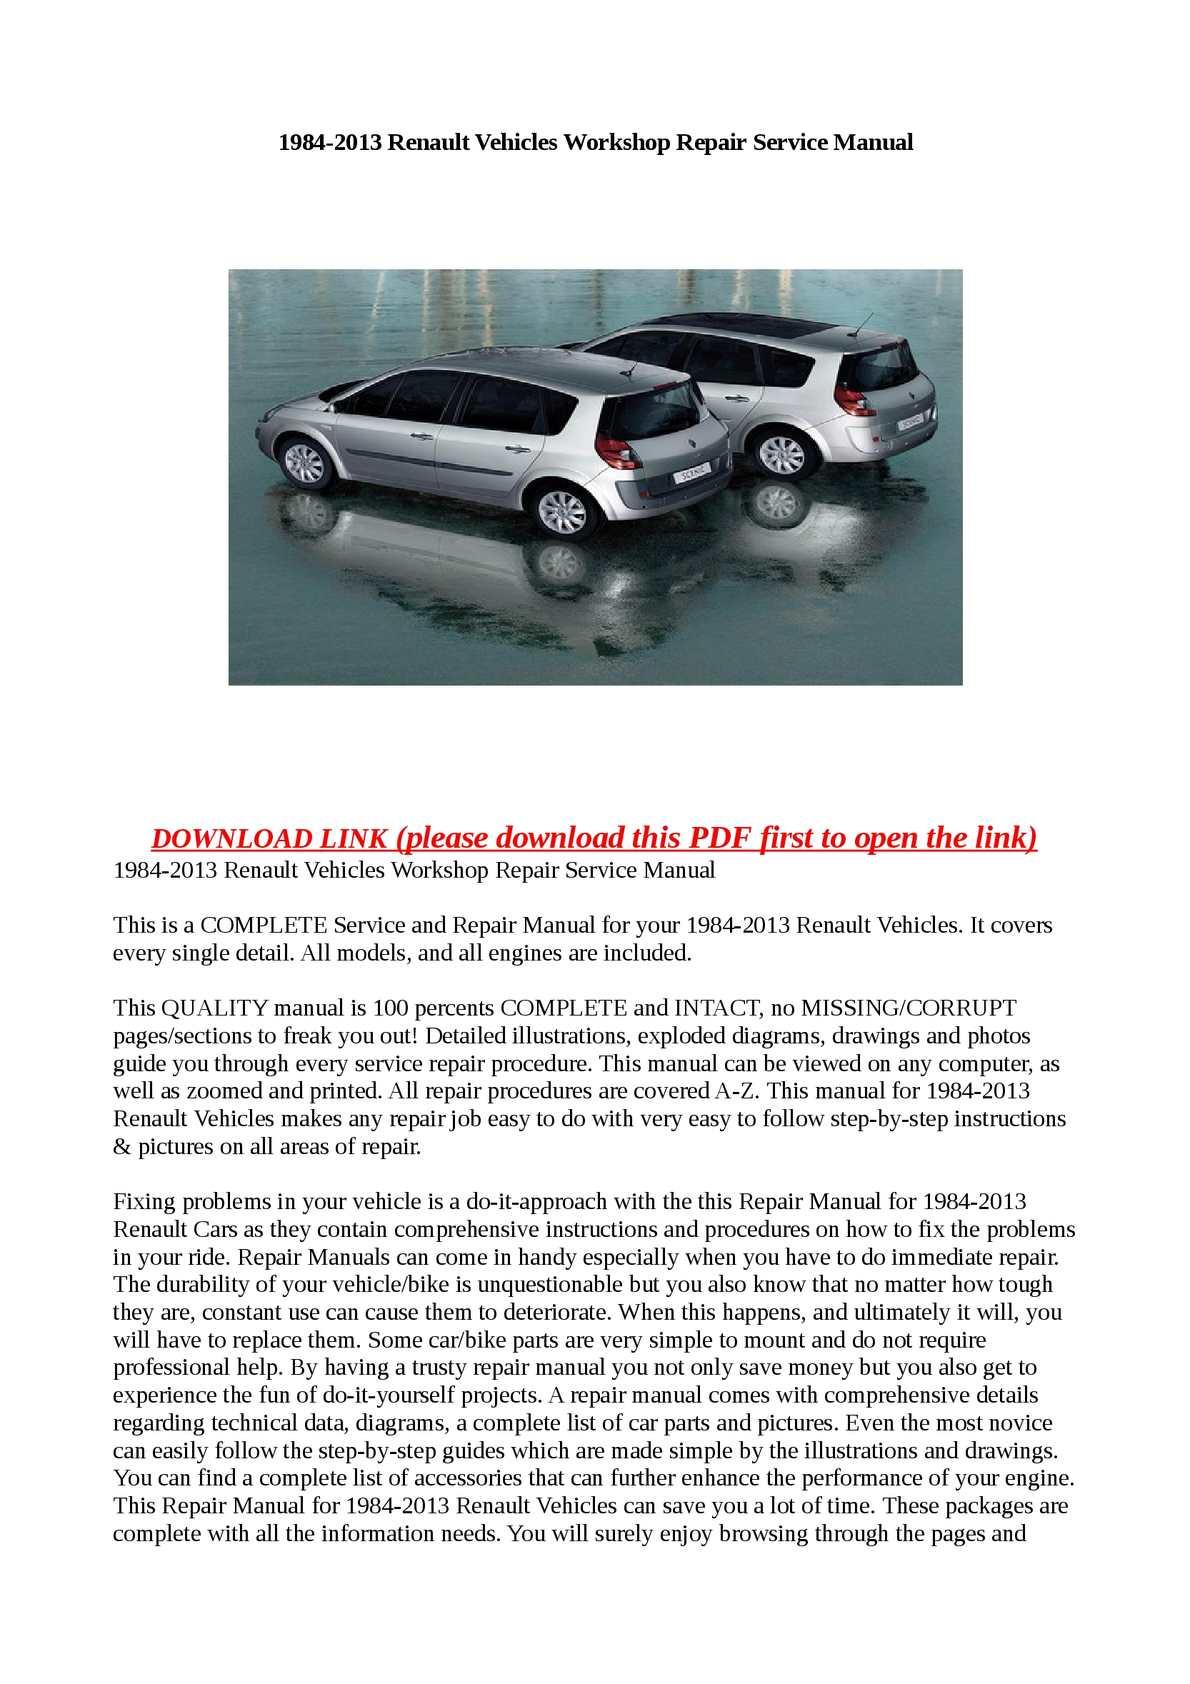 Calamo 1984 2013 renault vehicles workshop repair service manual fandeluxe Images